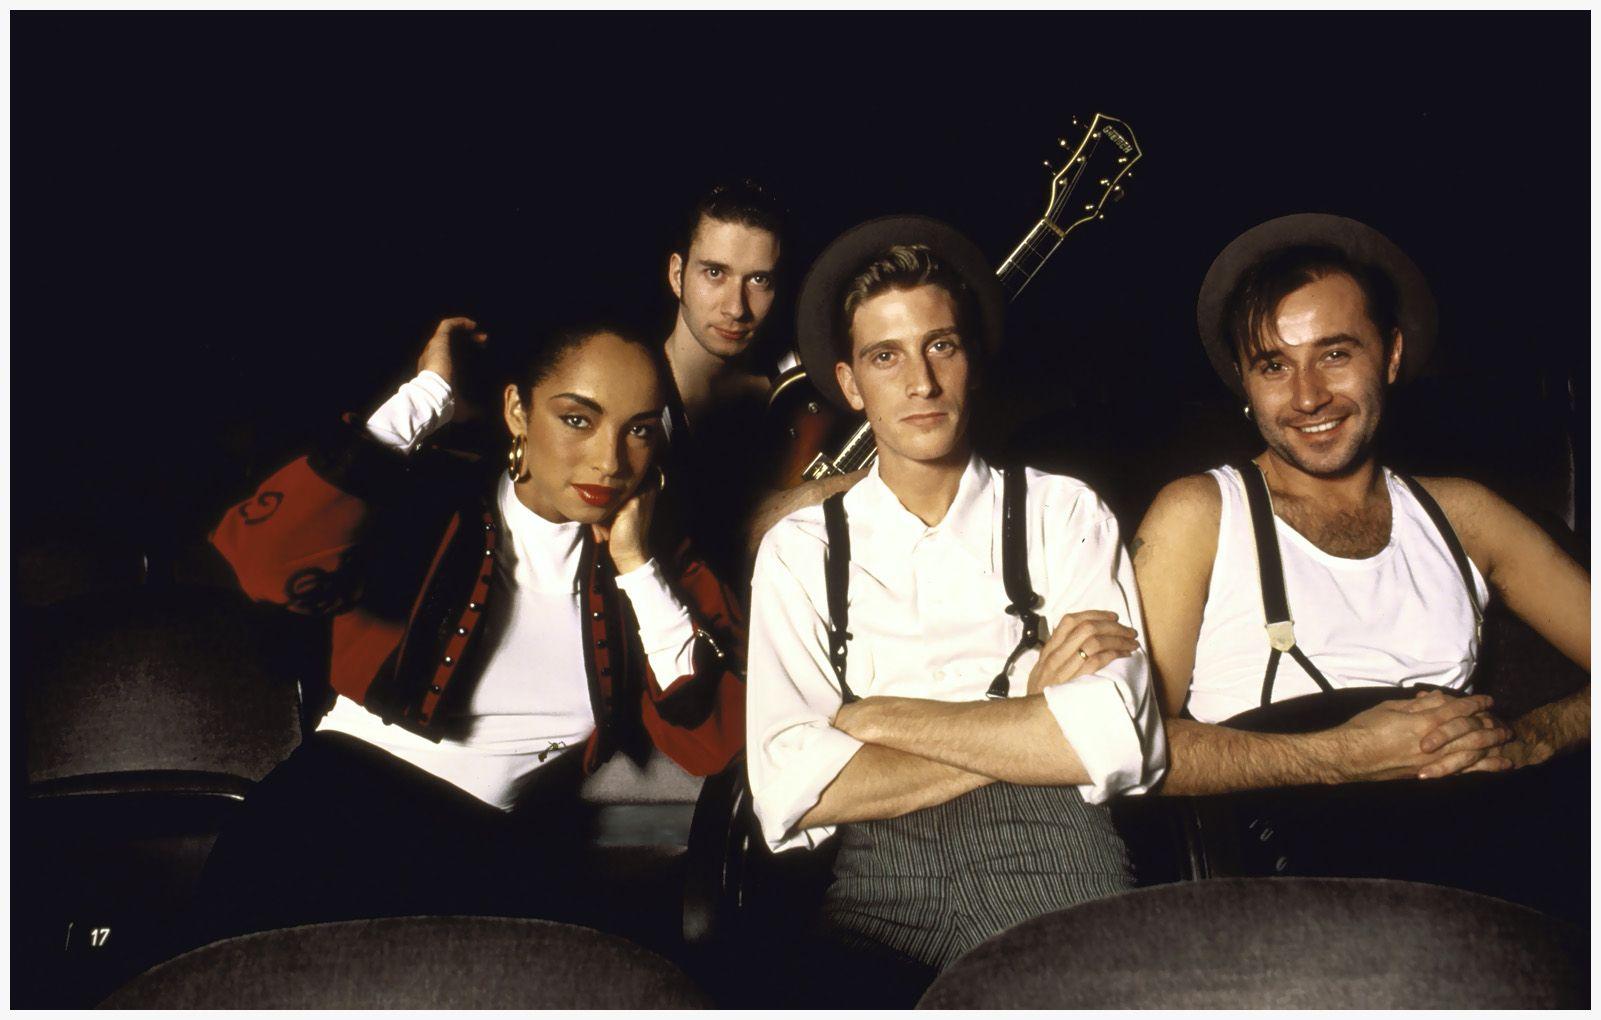 Ŧhe ₵oincidental Ðandy: Strong & Tender: The Musical Career of Sade